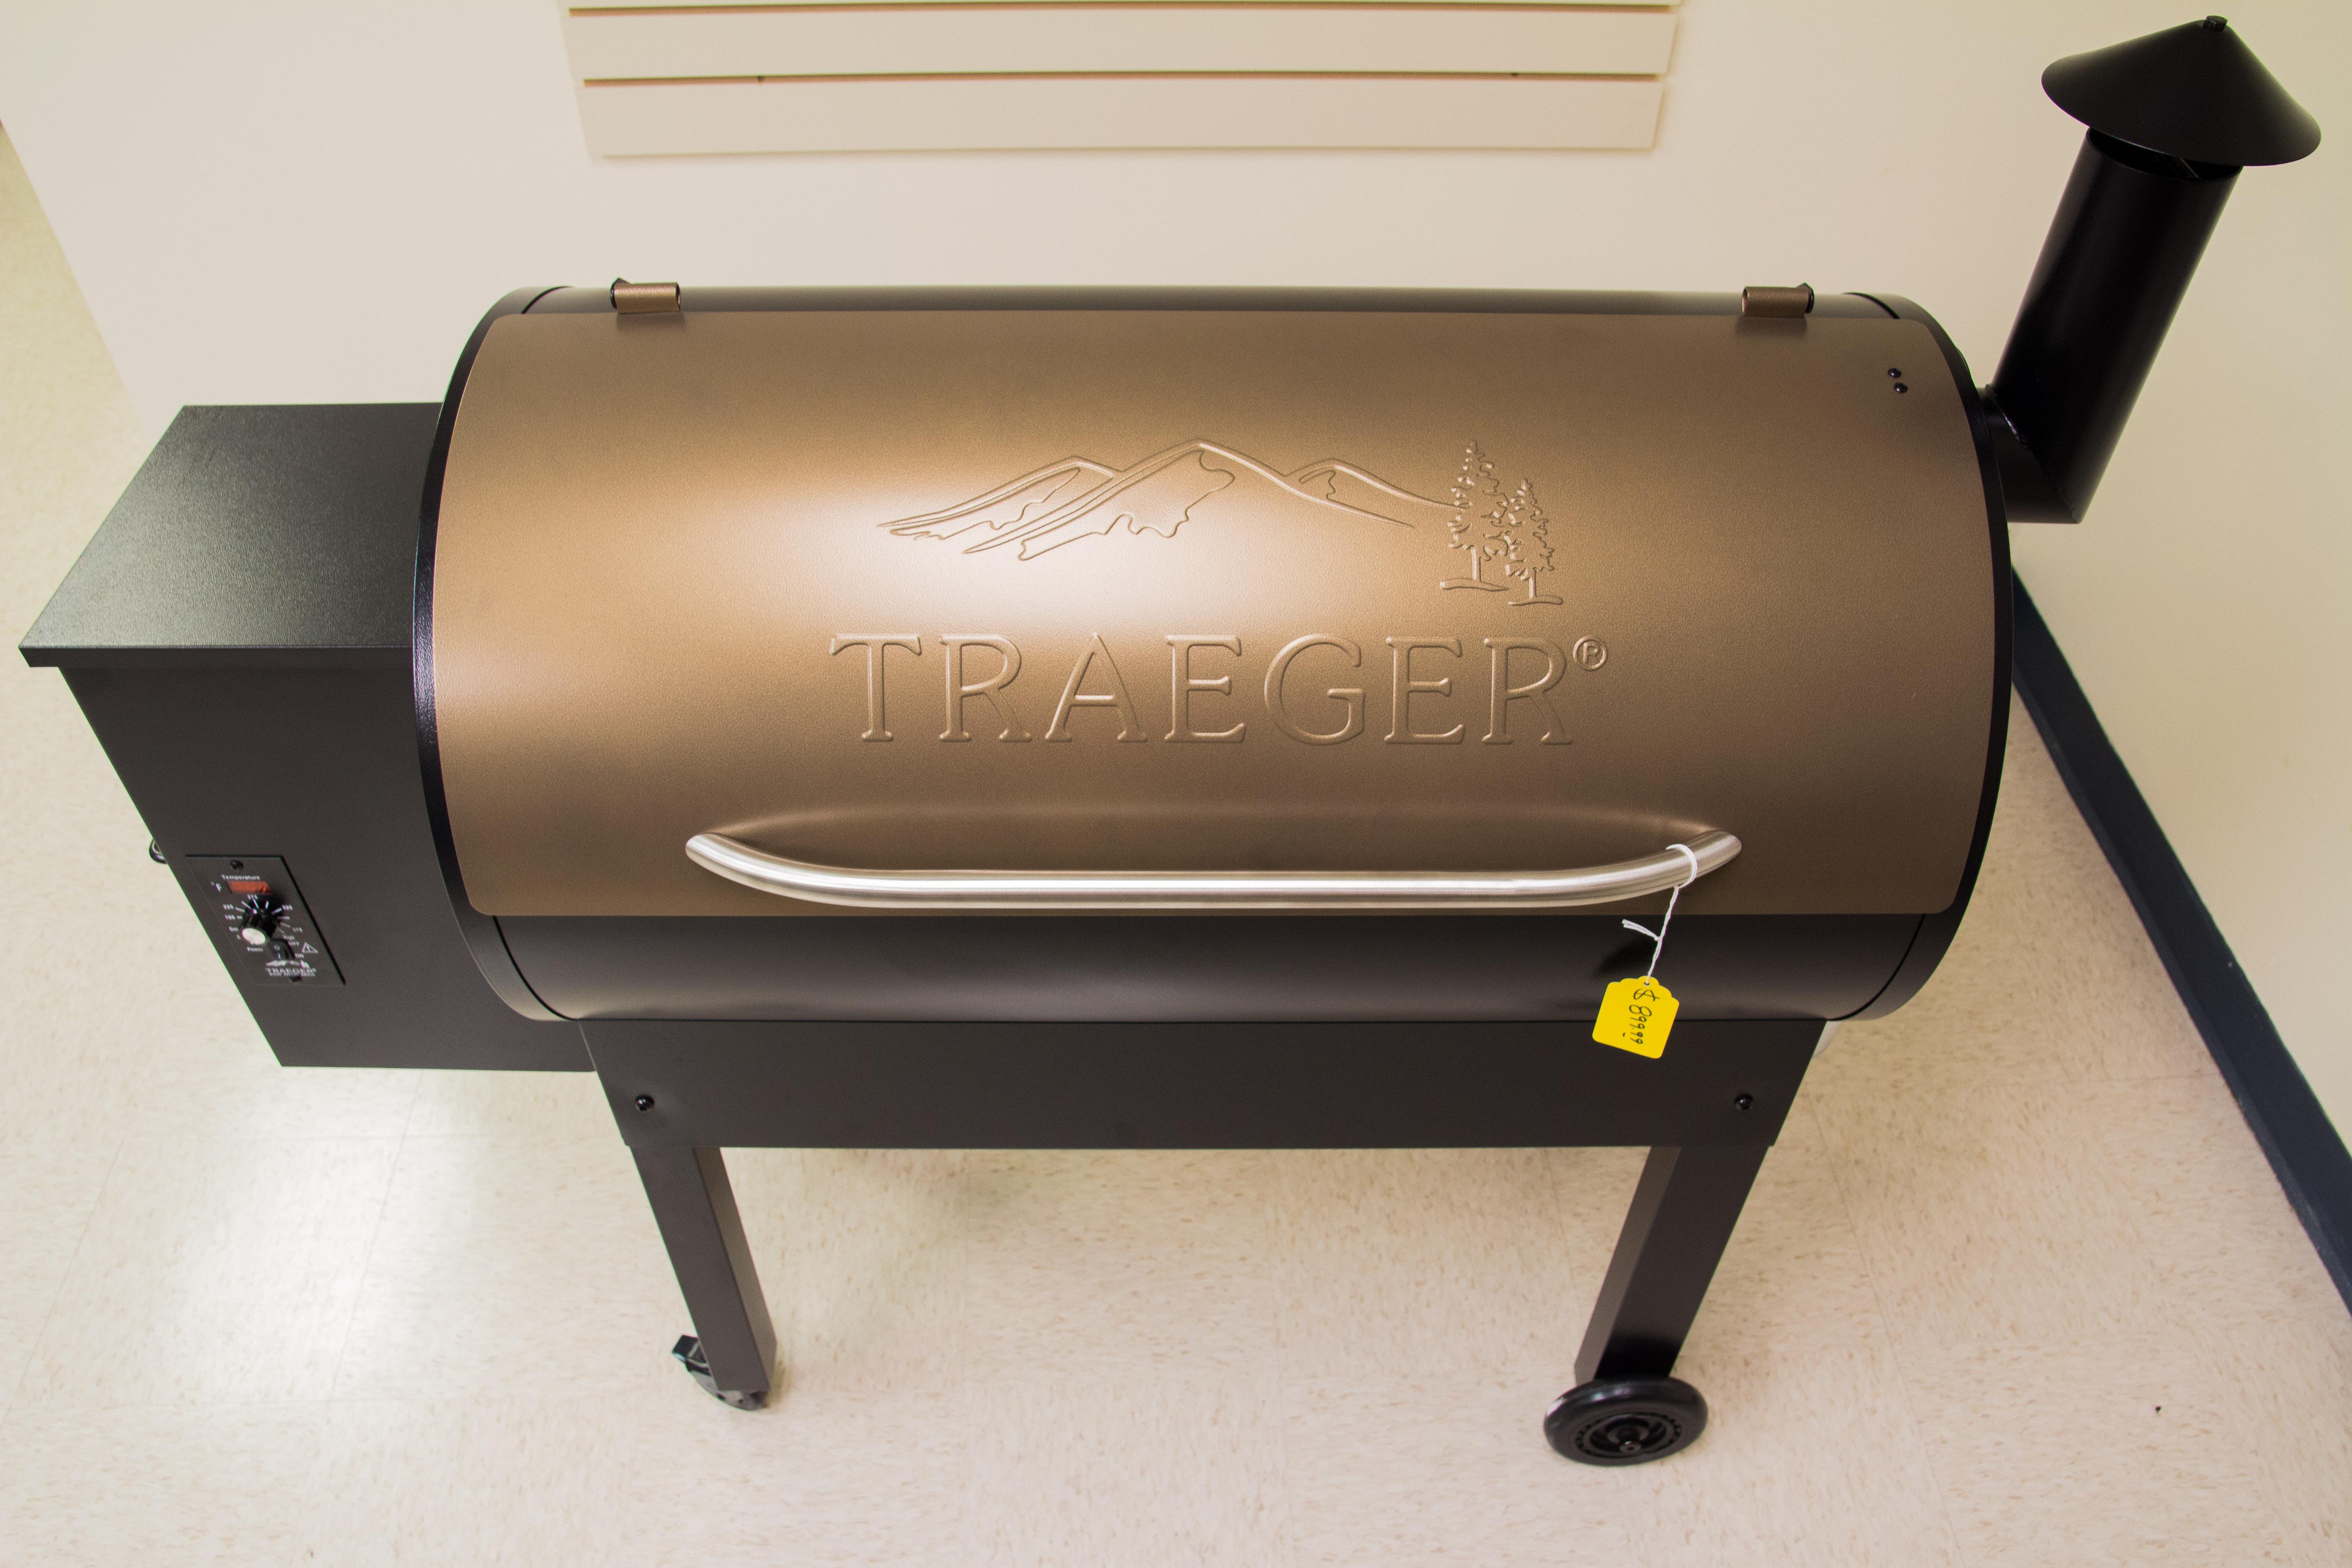 Traeger Pro Series Smoker